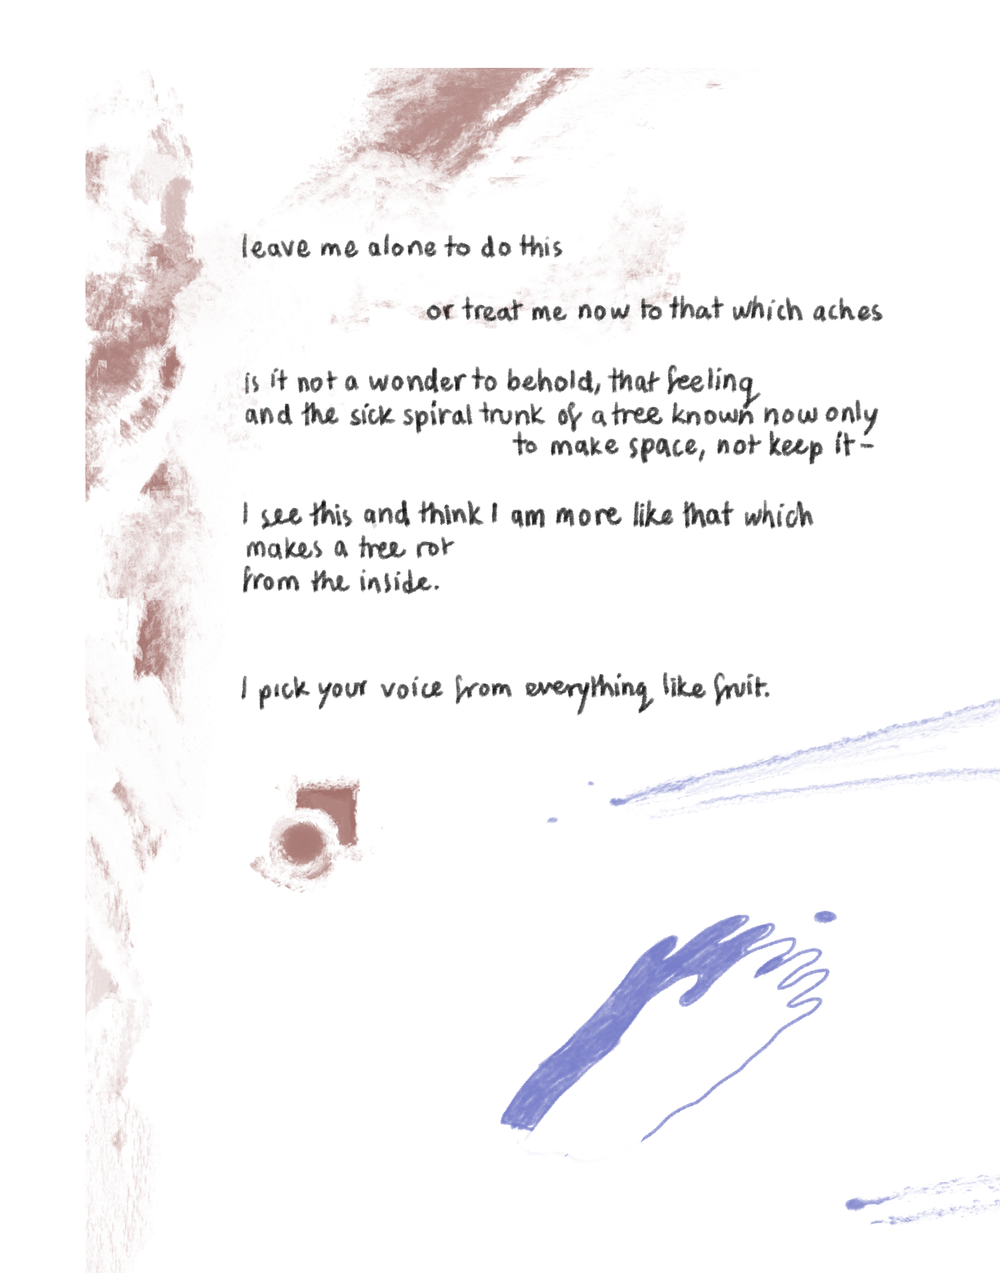 poem+5+writing.png